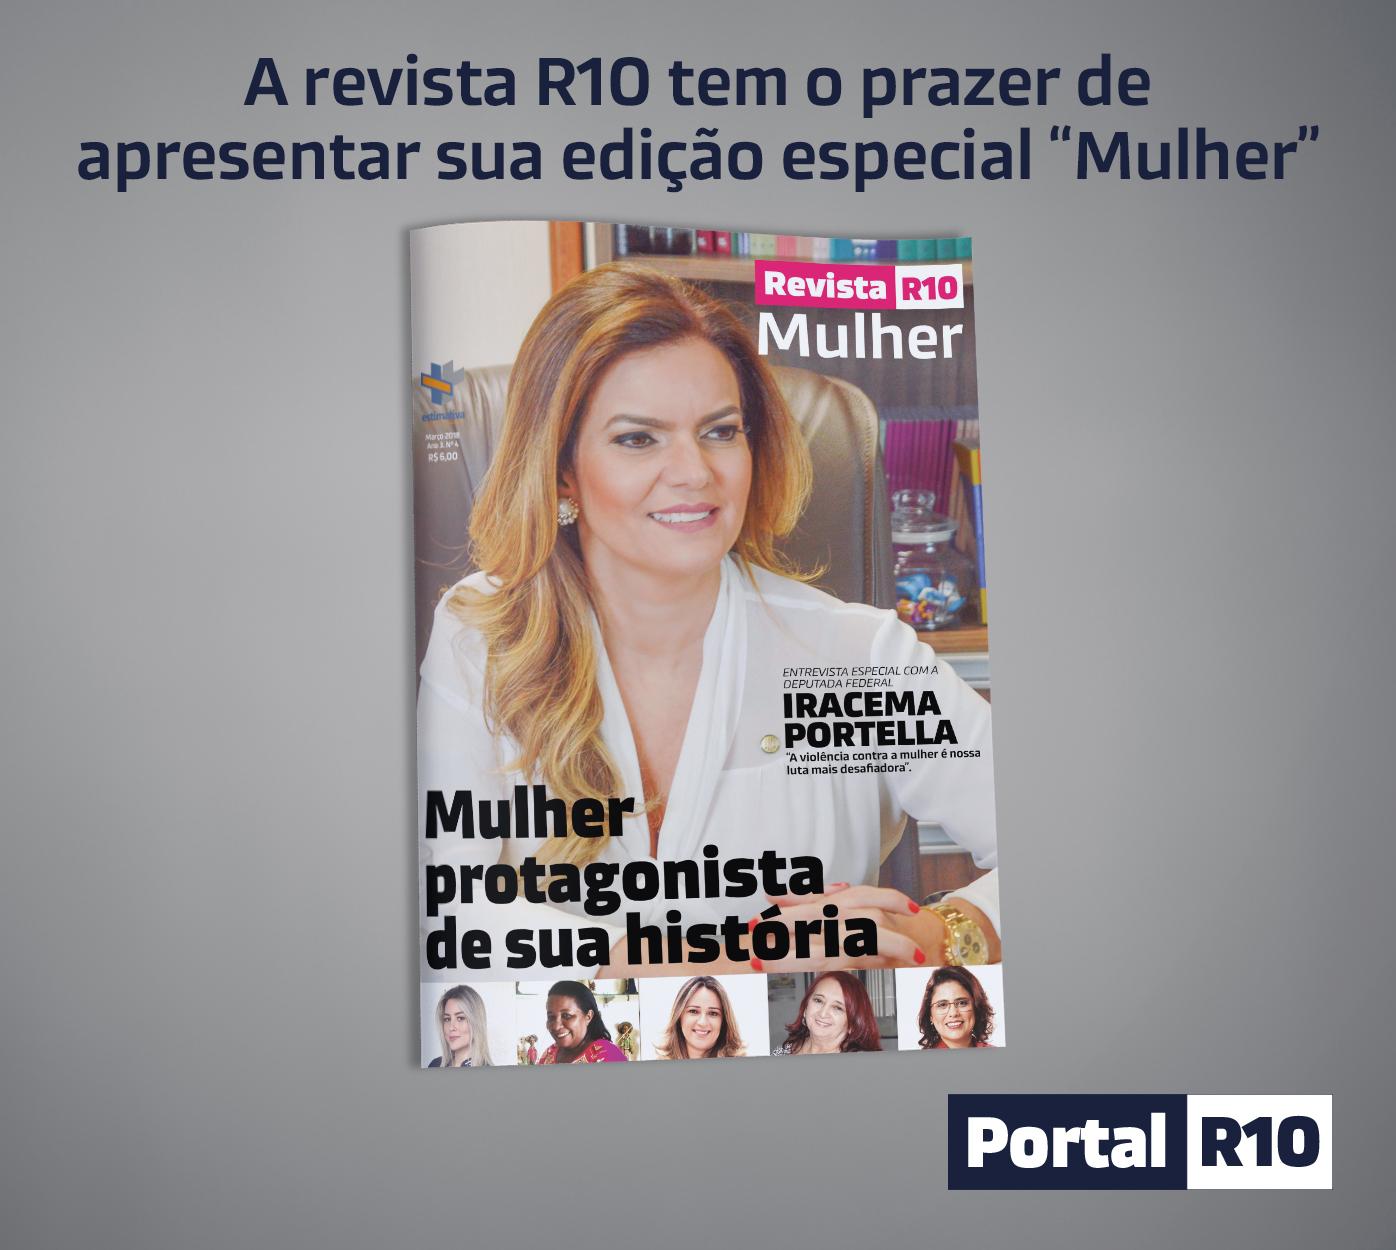 Revista R10 Mulher